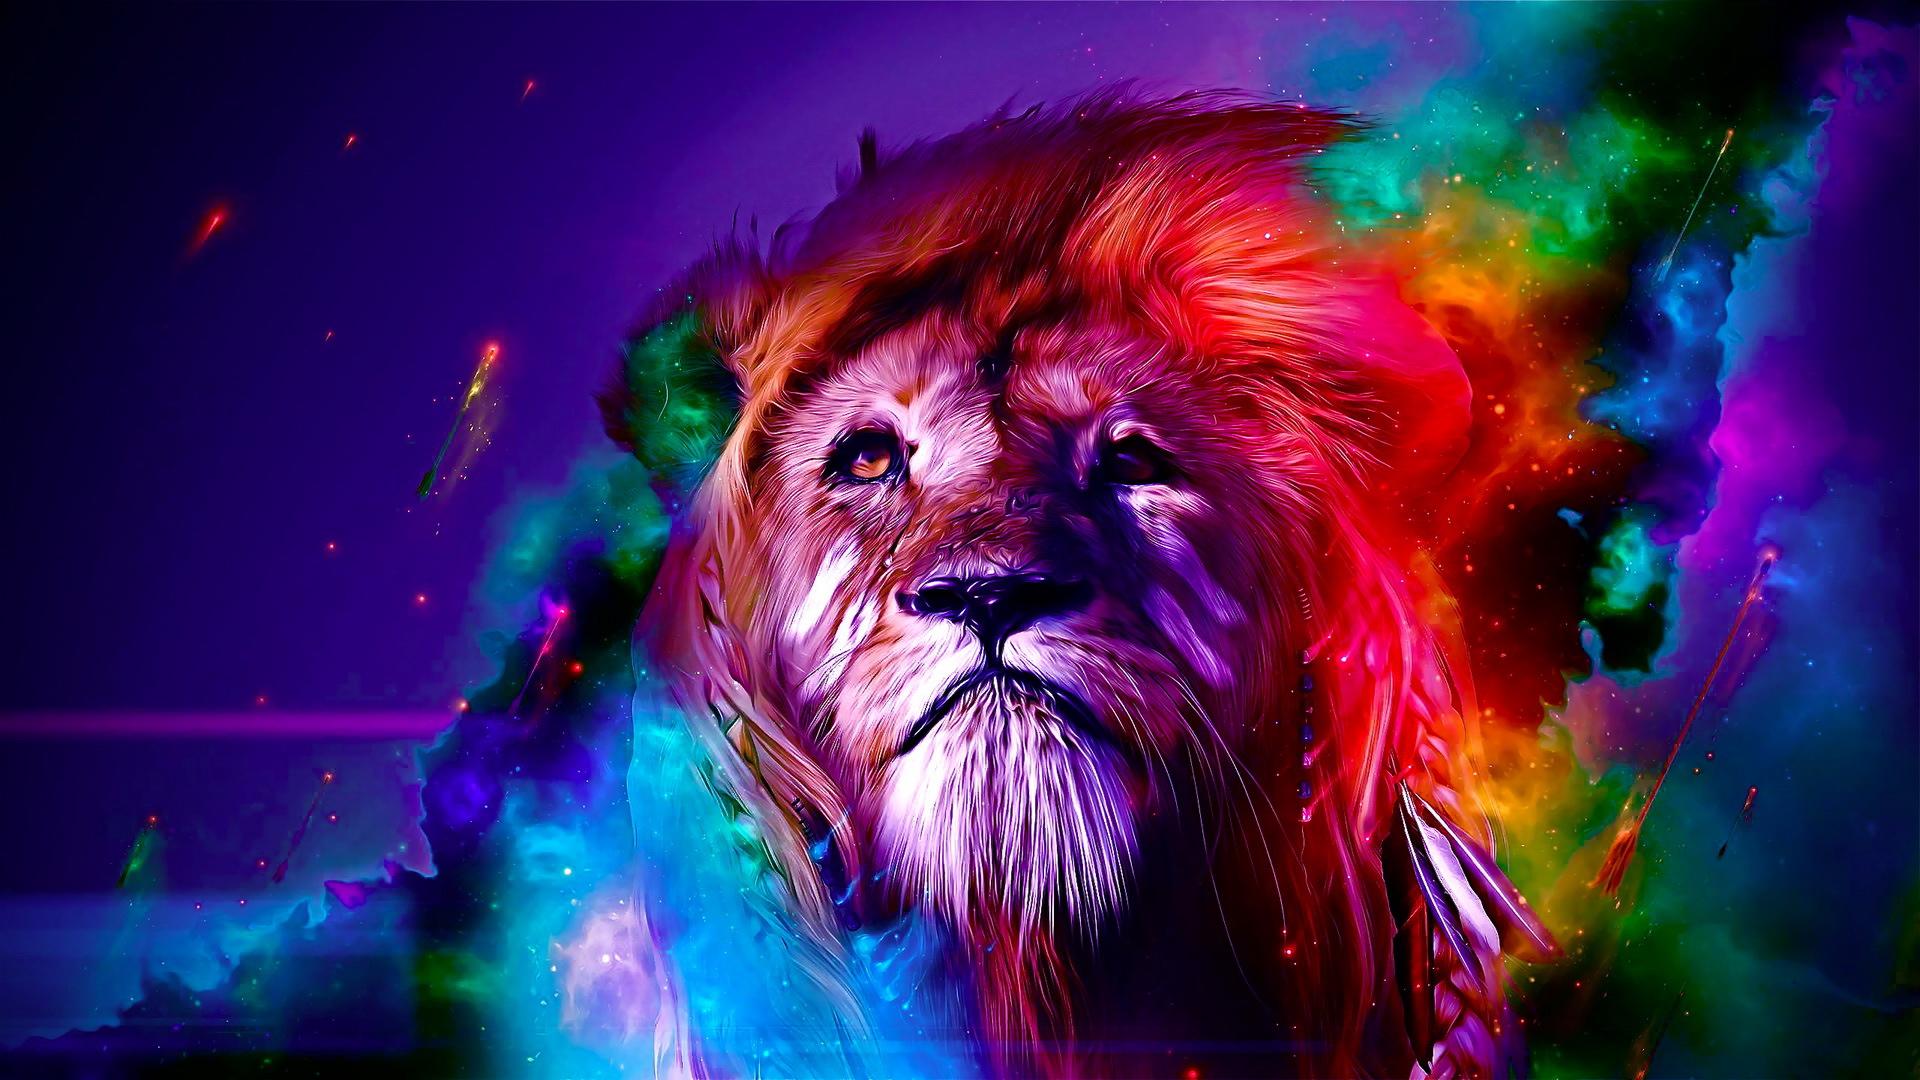 Colorful Lion Wallpaper – Free wallpaper download